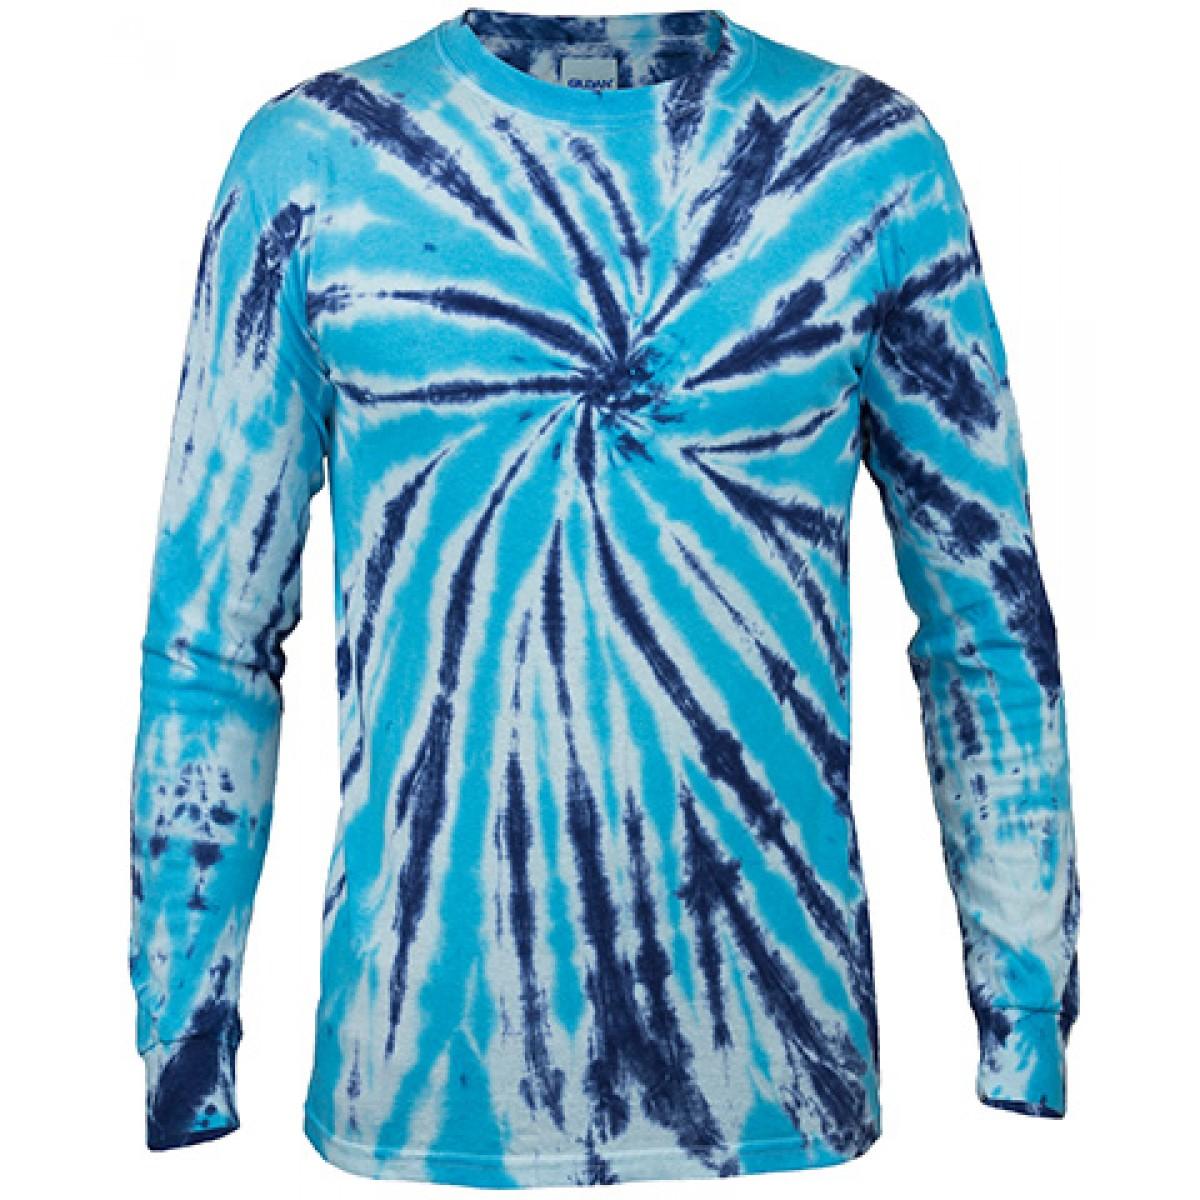 Multi Color Tie-Dye Long Sleeve Shirt -Royal Blue-YM